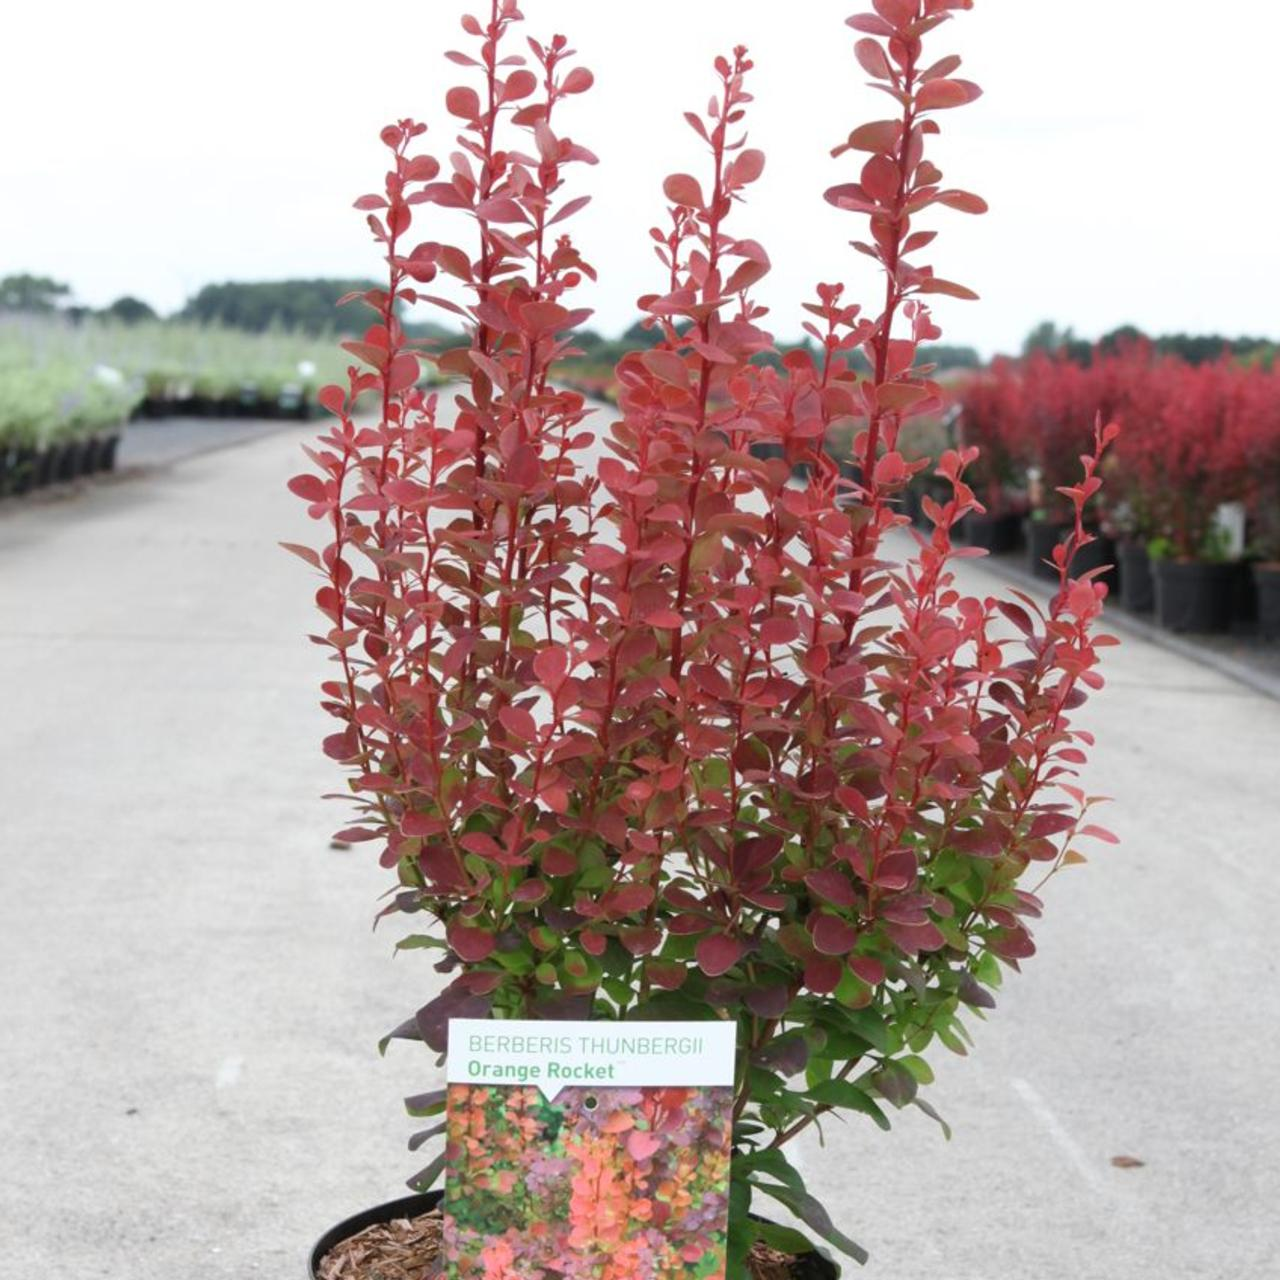 Berberis thunbergii 'Orange Rocket' plant